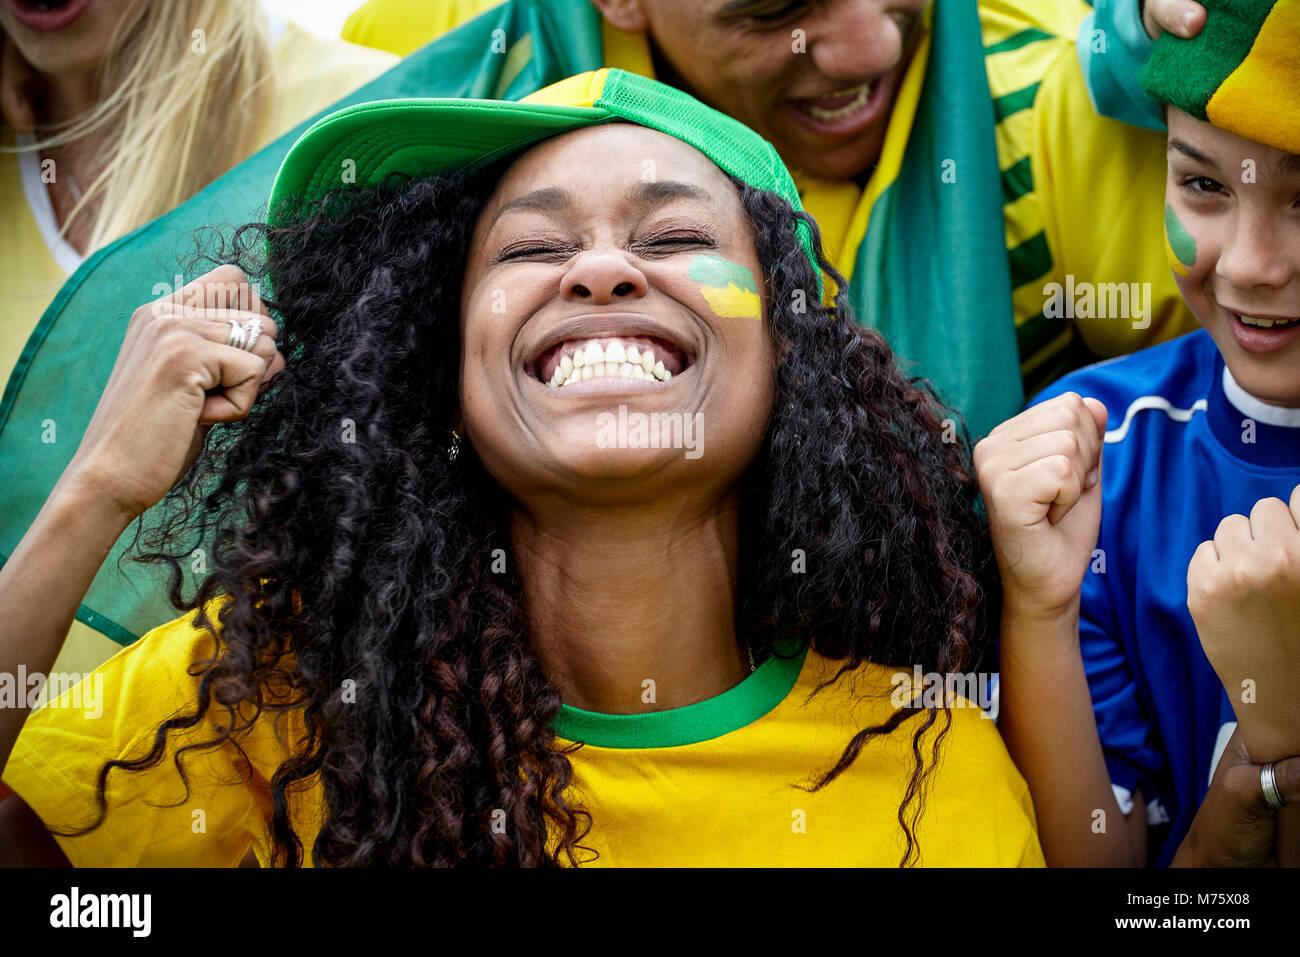 Brasilianischen Fußball-Fans im Match Stockbild